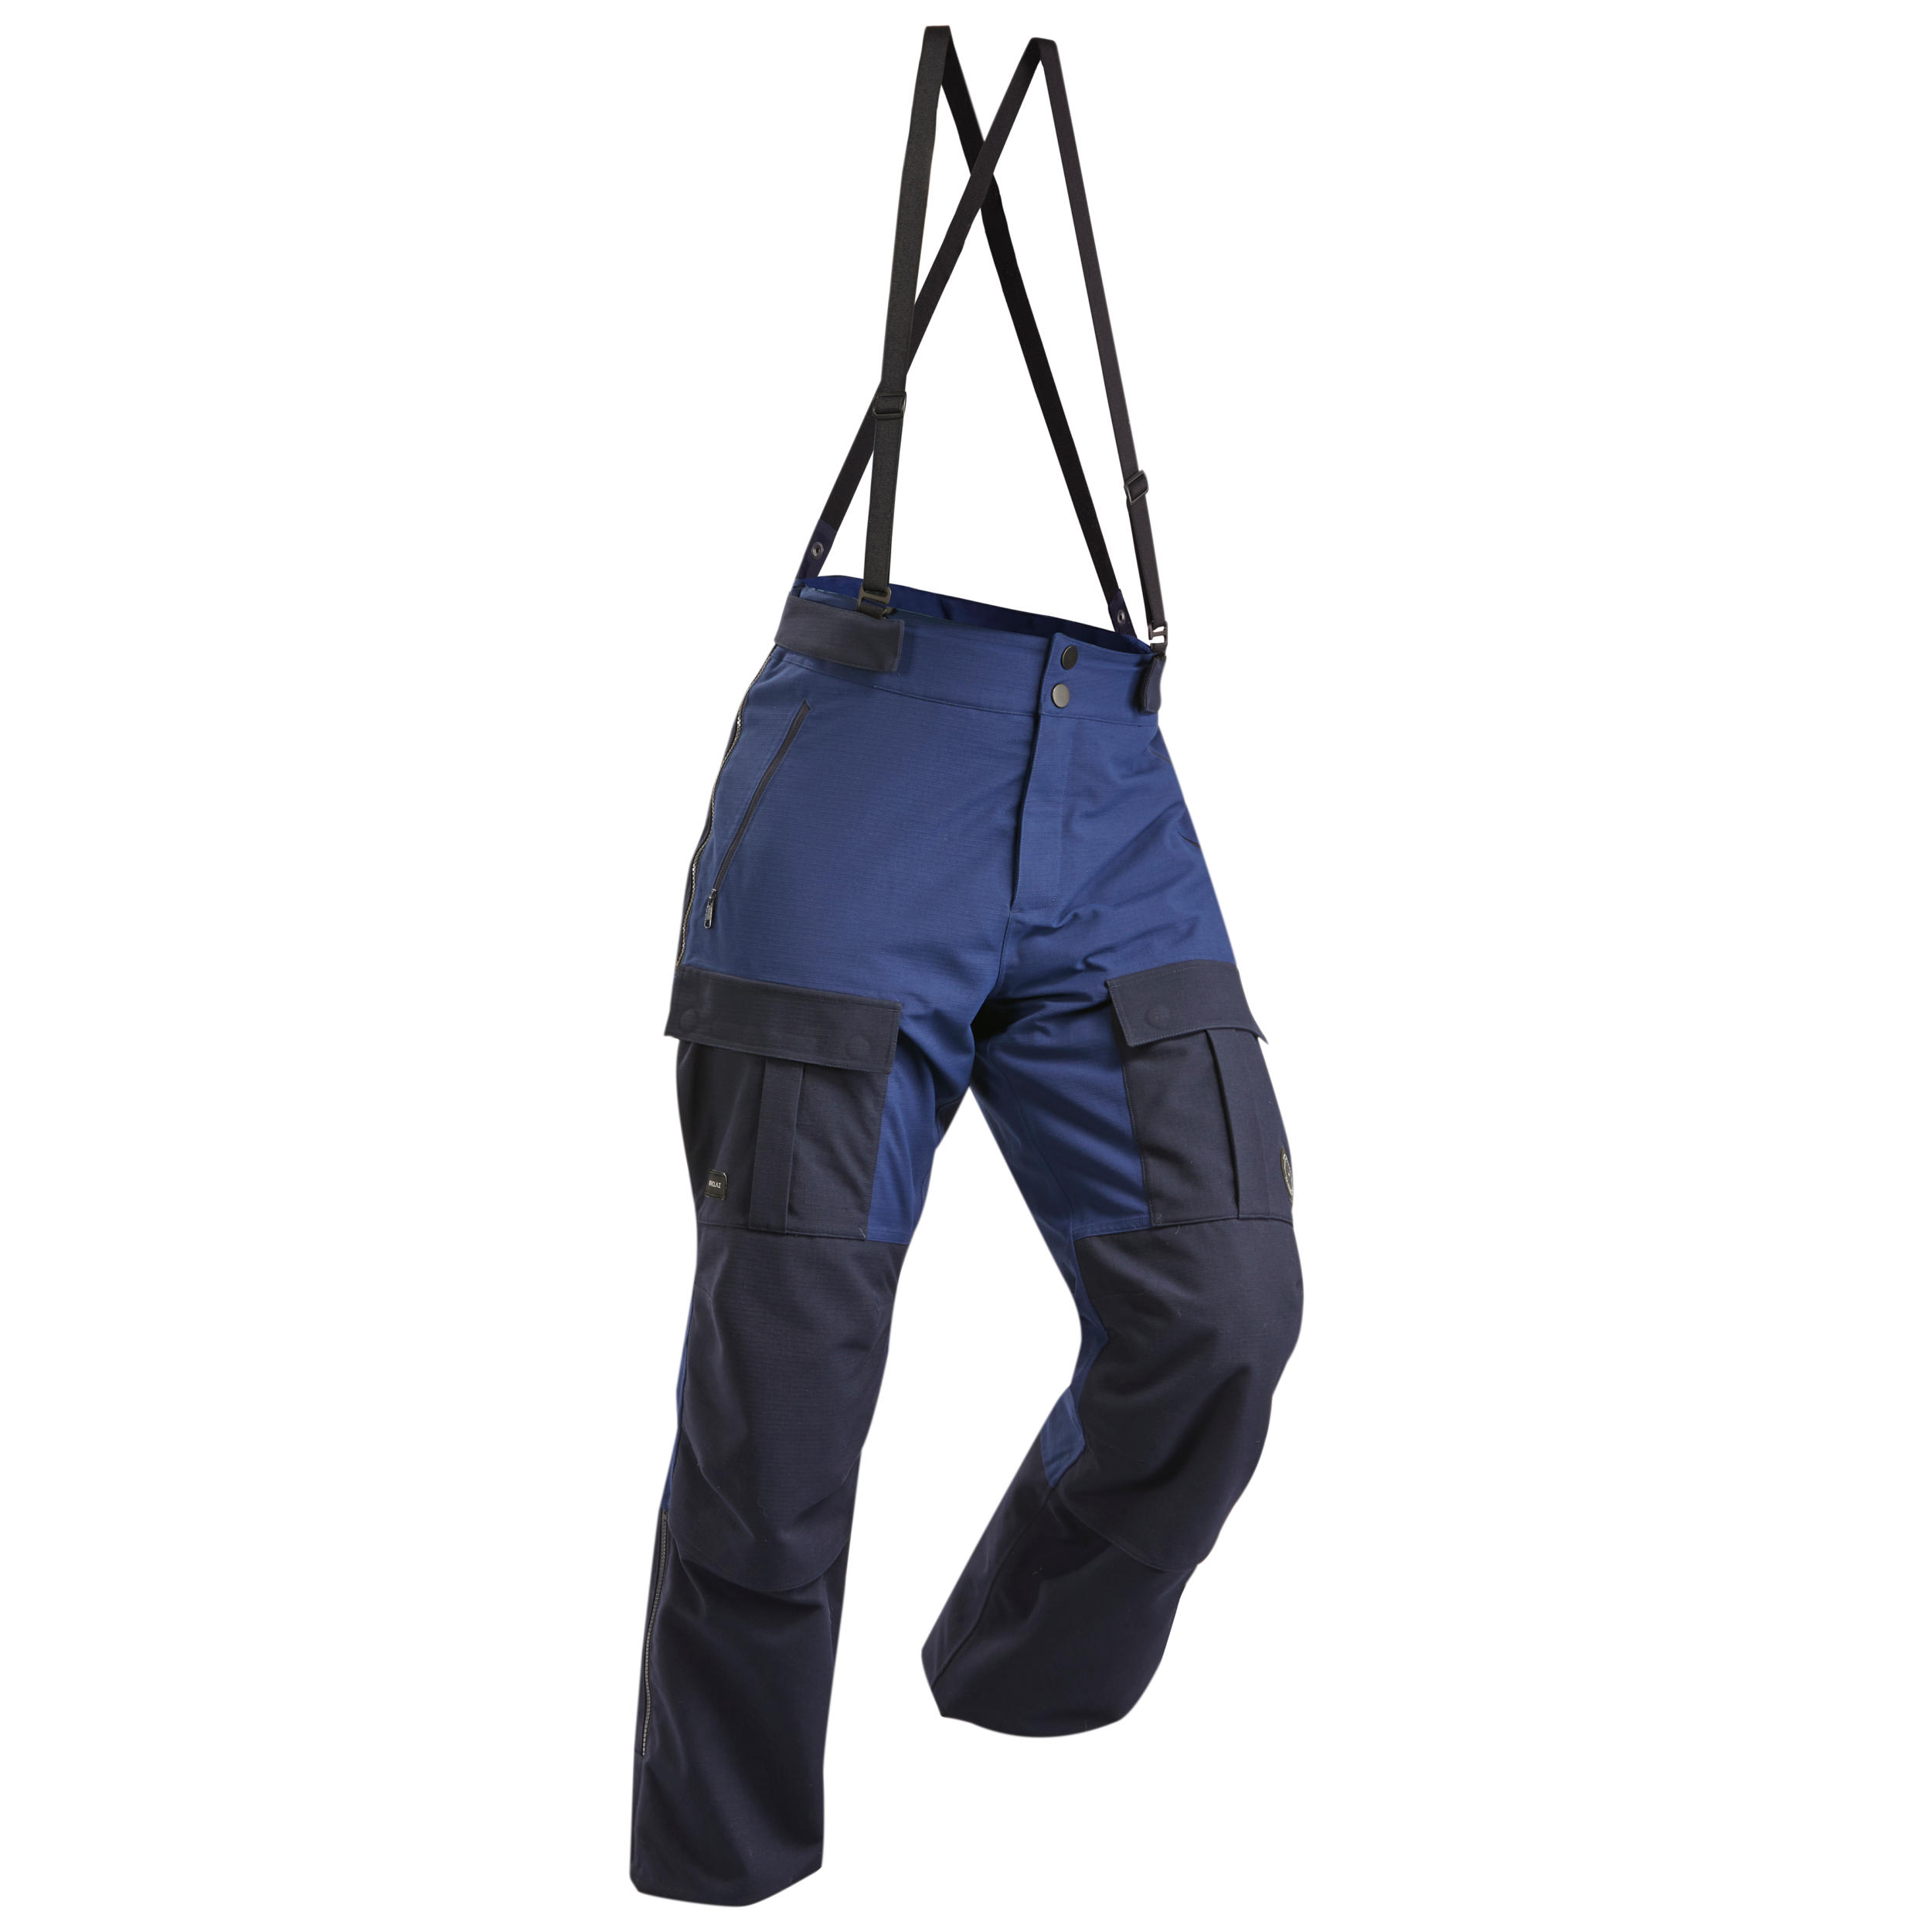 Pantalon ARCTIC 500 EXTRA WARM imagine